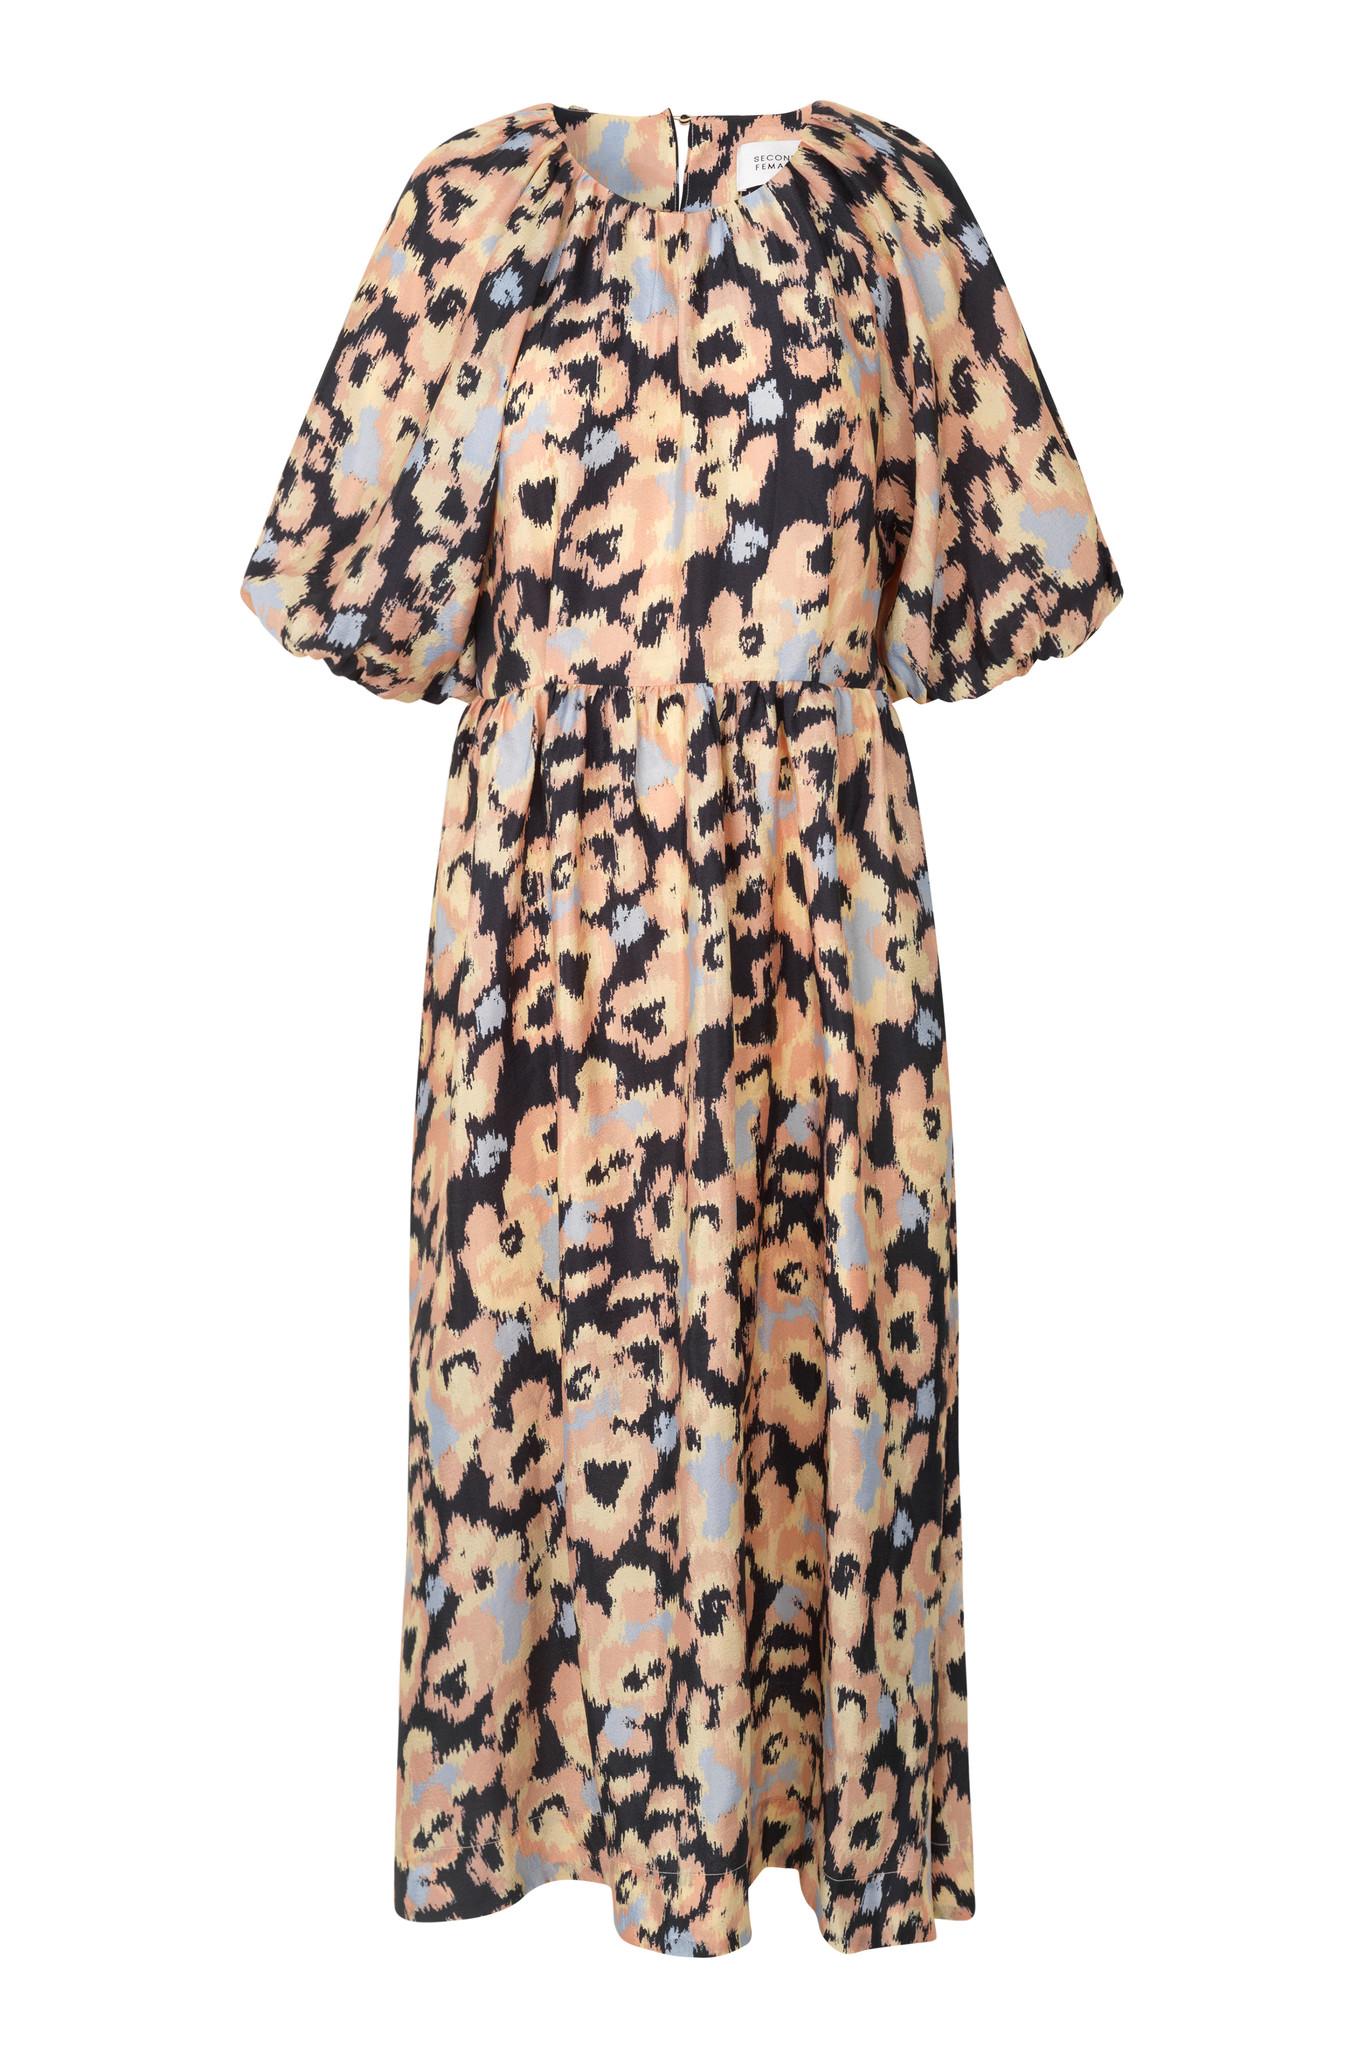 Dress Ruth